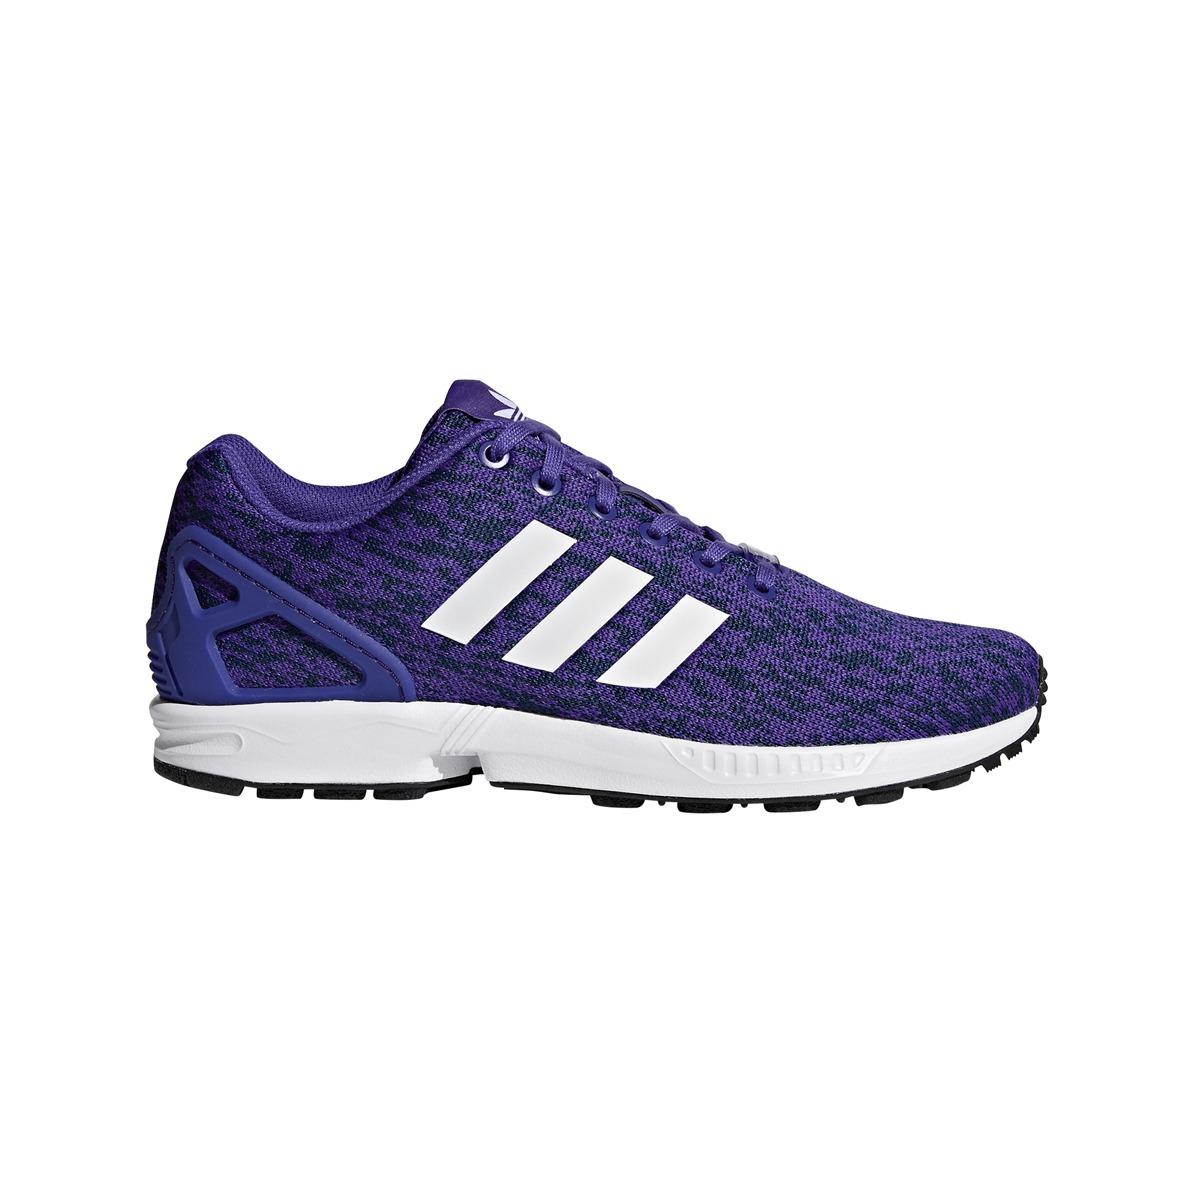 sports shoes 663d3 5a046 zapatillas adidas originals moda zx flux hombre vi mn. Cargando zoom.